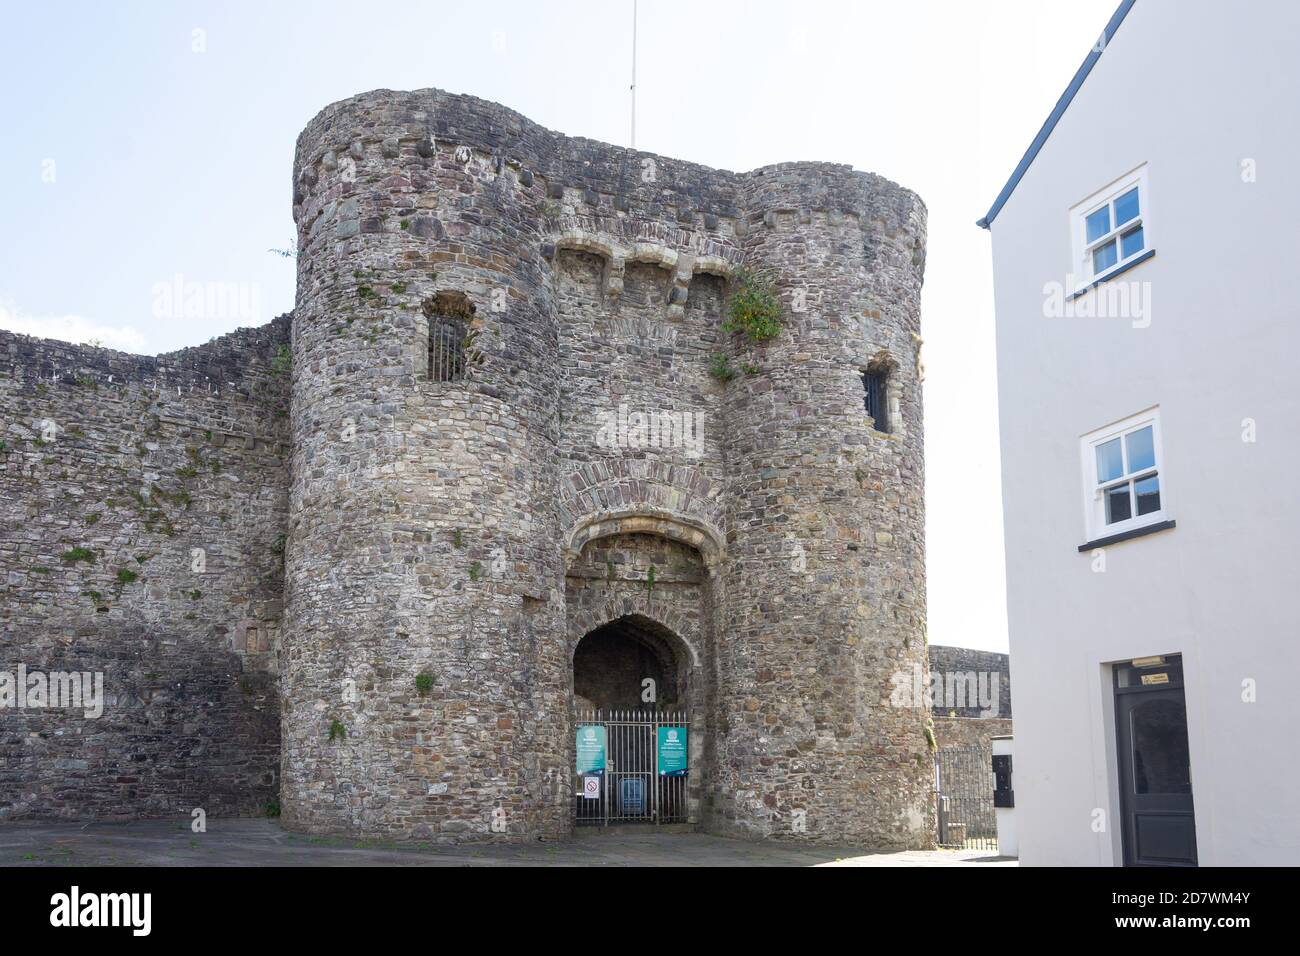 Carmarthen Castle entrance gate, Old Town Square, Carmarthen (Caerfyrddin), Carmarthenshire, Wales, United Kingdom Stock Photo